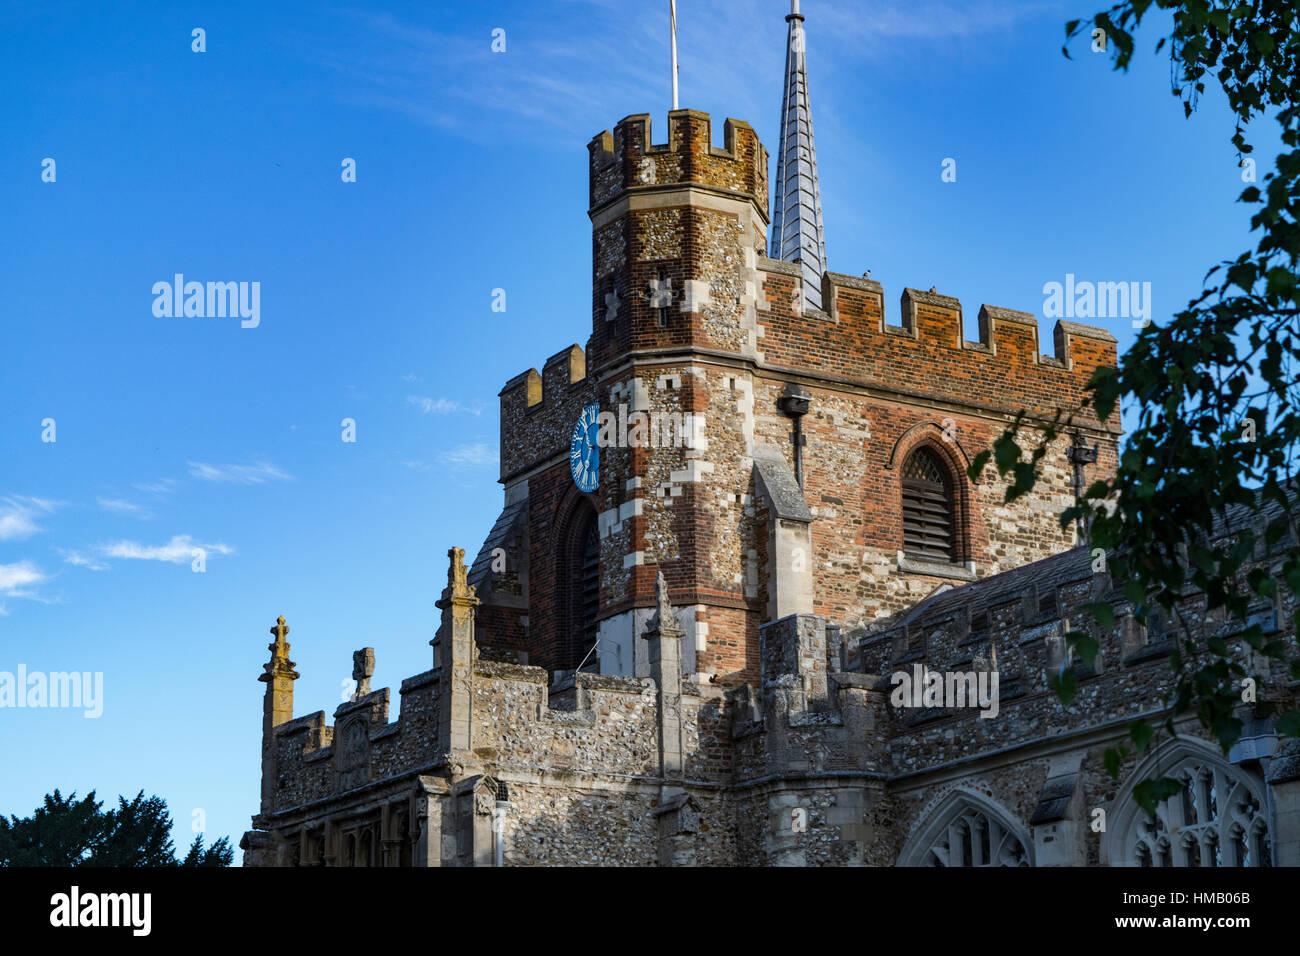 Clock tower of St Marys Church, Hitchin, Hertfordshire - Stock Image